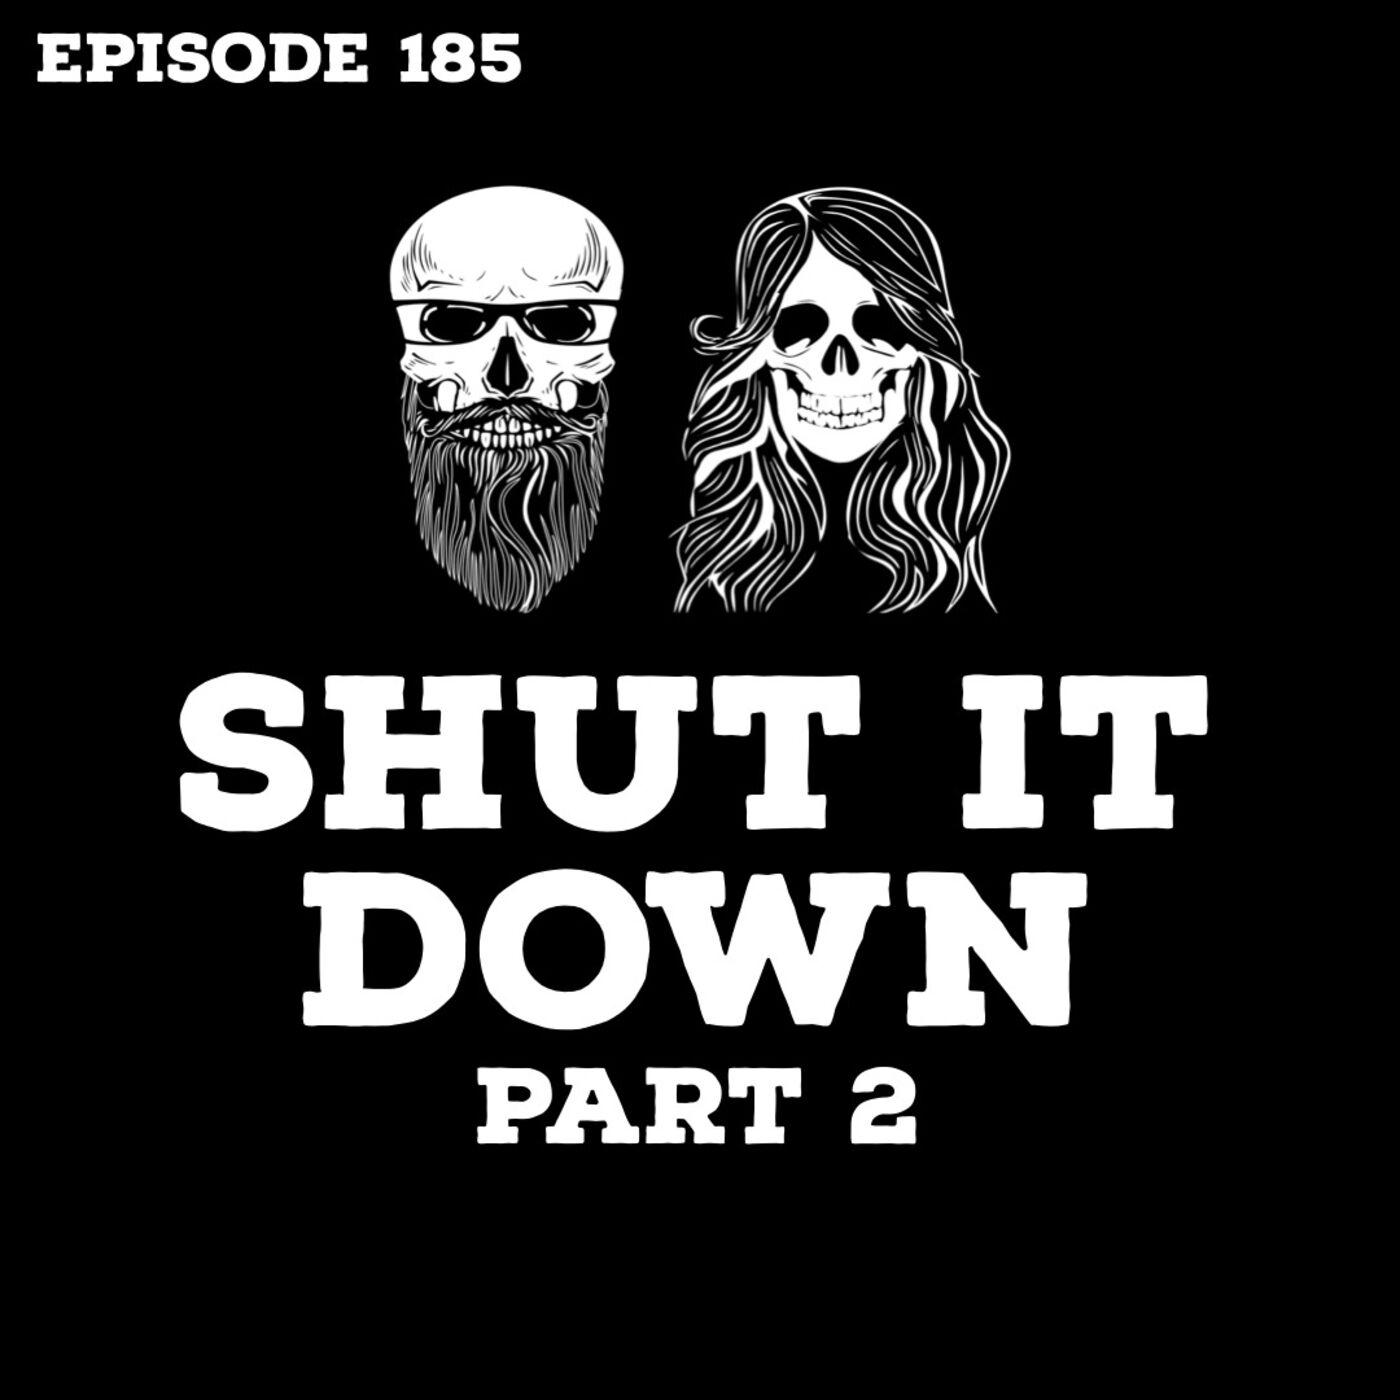 Episode 185: Shut It Down Part 2